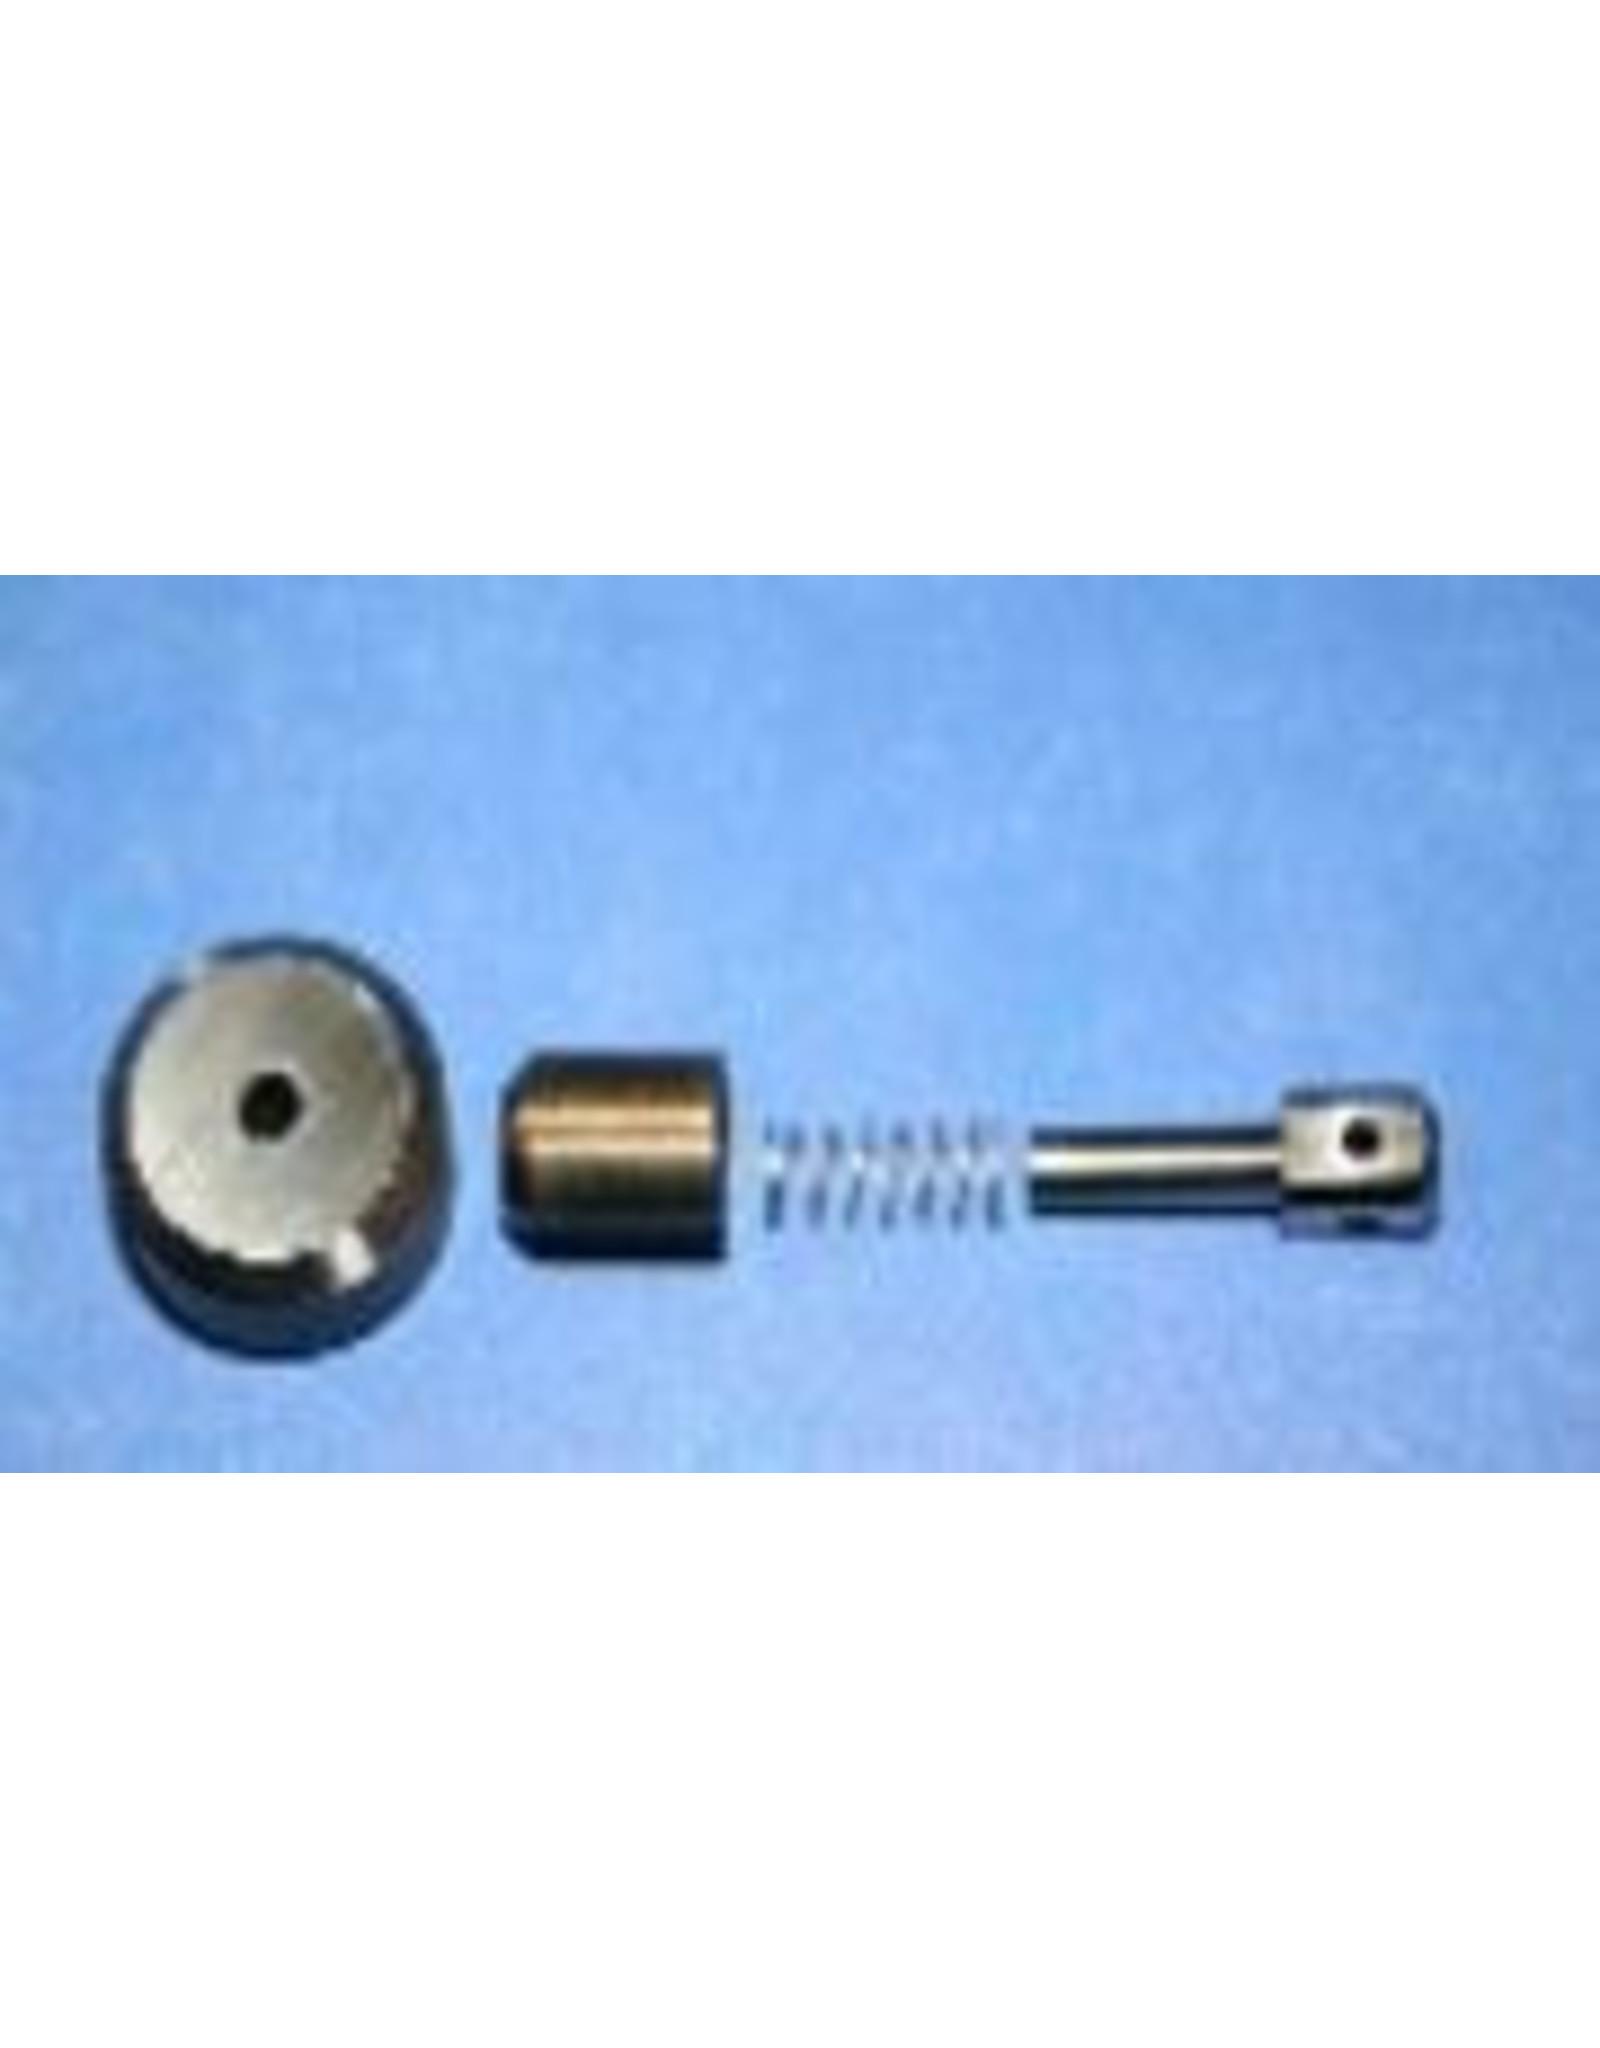 KMT Style Repair Kit, Check Valve (Seal Head), Flat Poppets